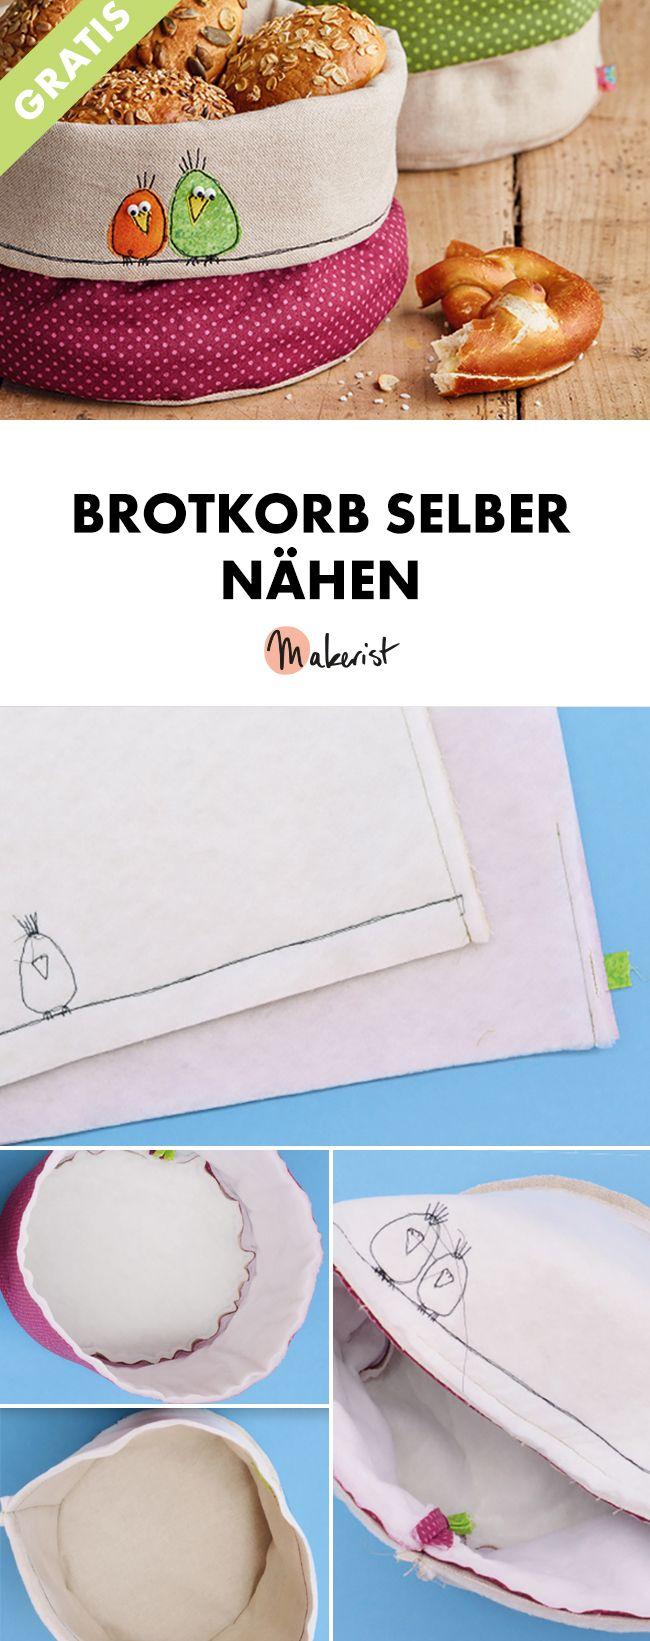 Brotkorb selber nähen - kostenlose Nähanleitung via Makerist.de #strickenundnähen